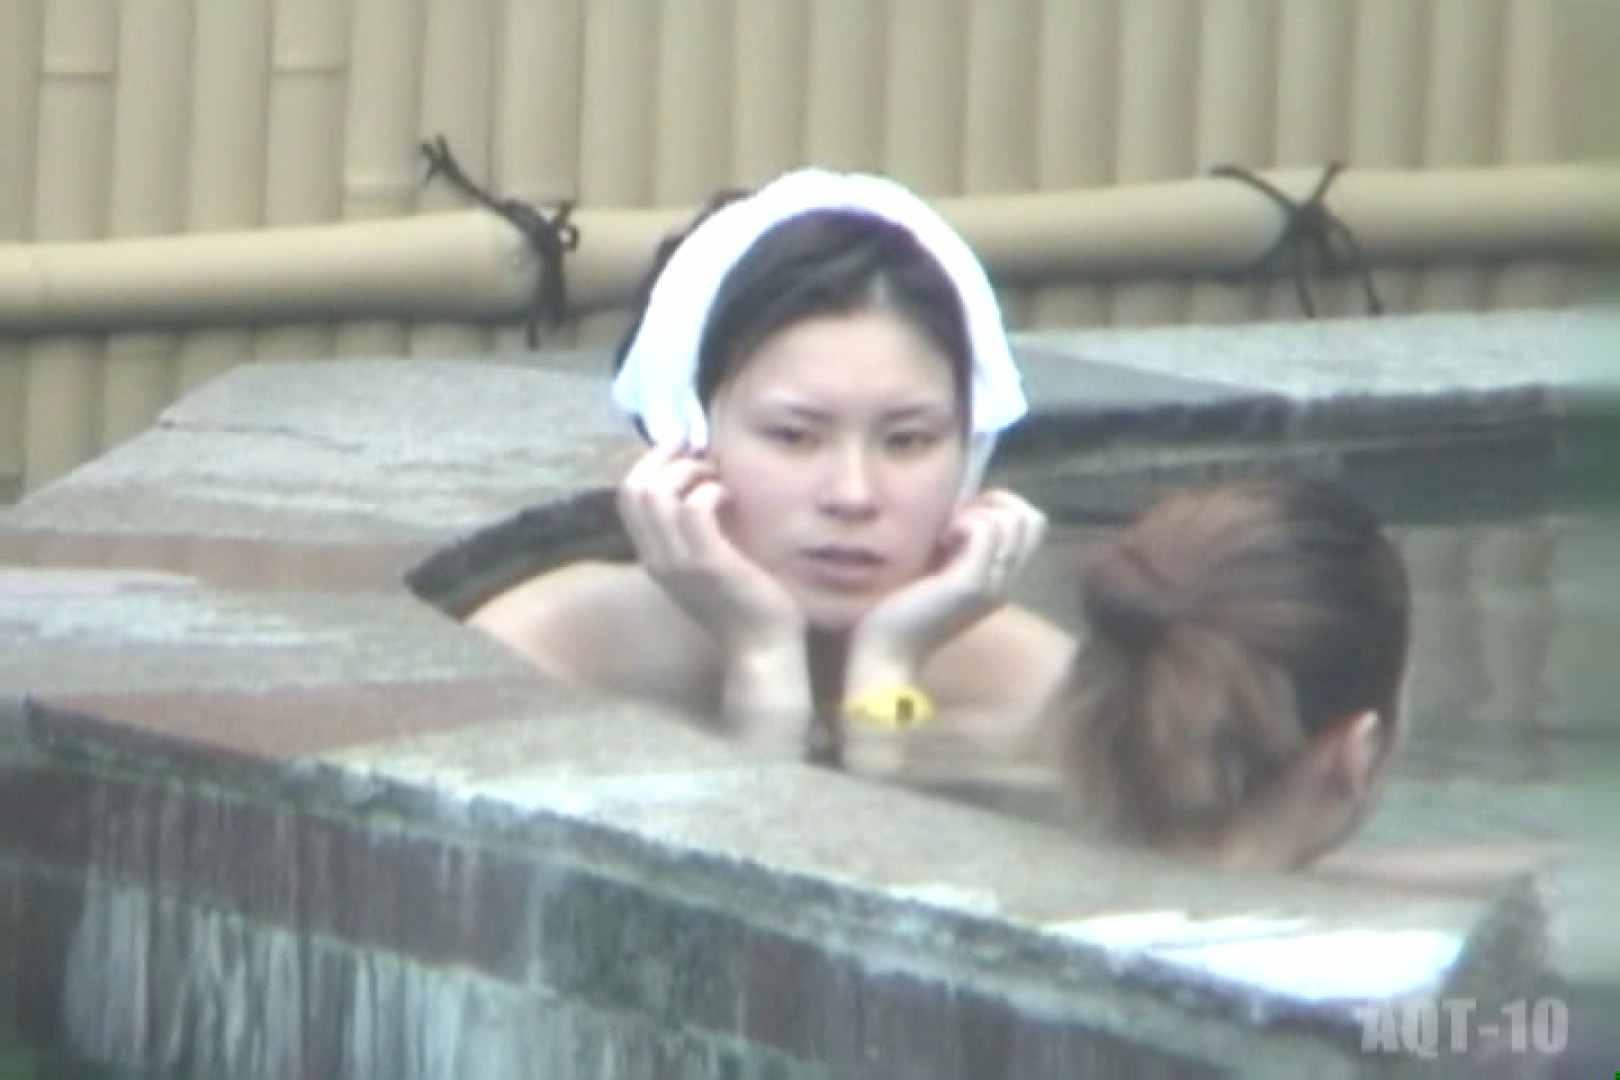 Aquaな露天風呂Vol.792 盗撮  53連発 20